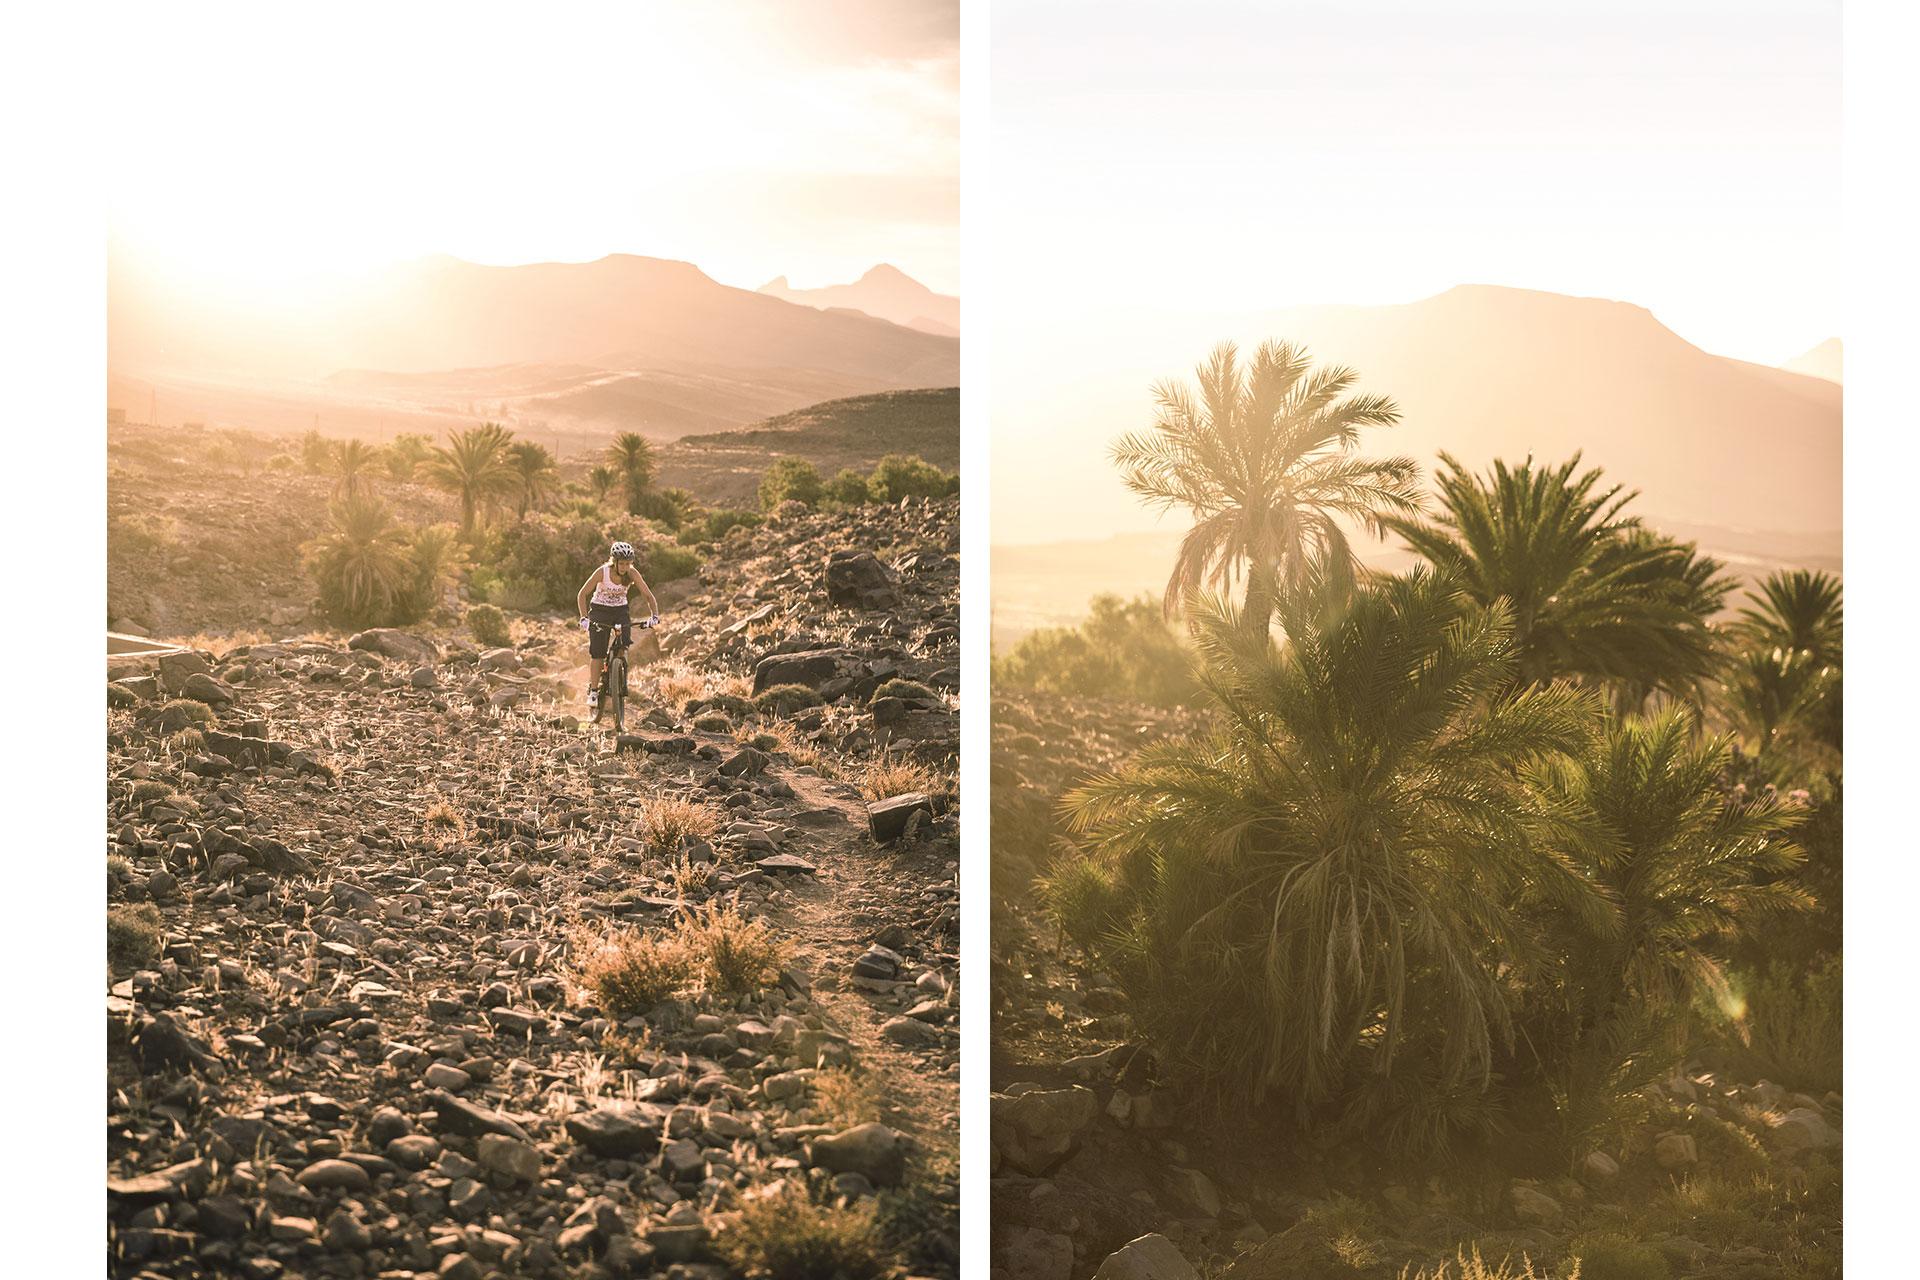 Outdoor Landschaft Travel Reisen Sport Fotograf Mountainbike Marokko Sonnenuntergang